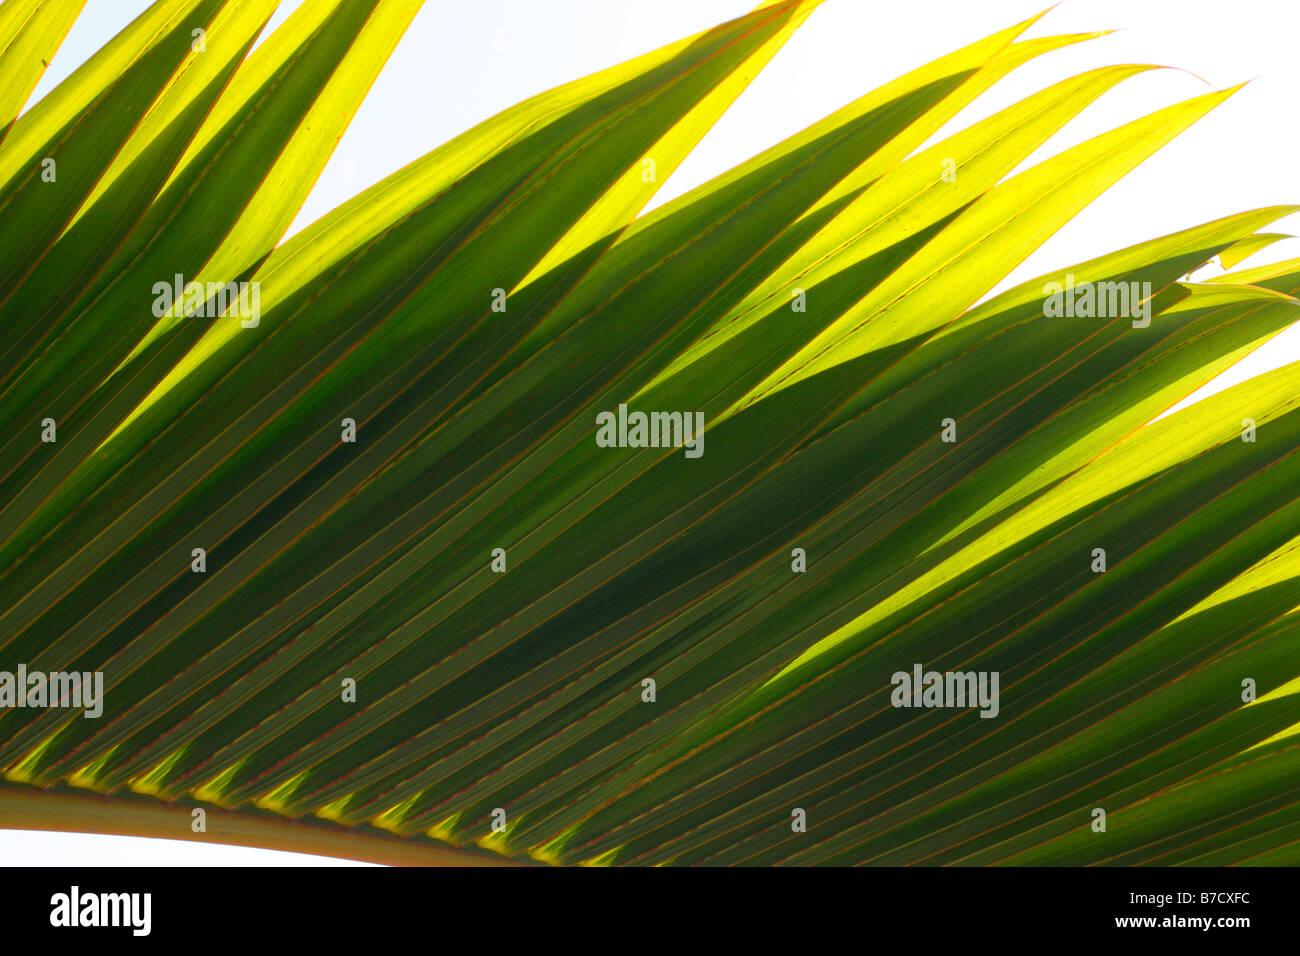 Palm tree leaf close up. - Stock Image